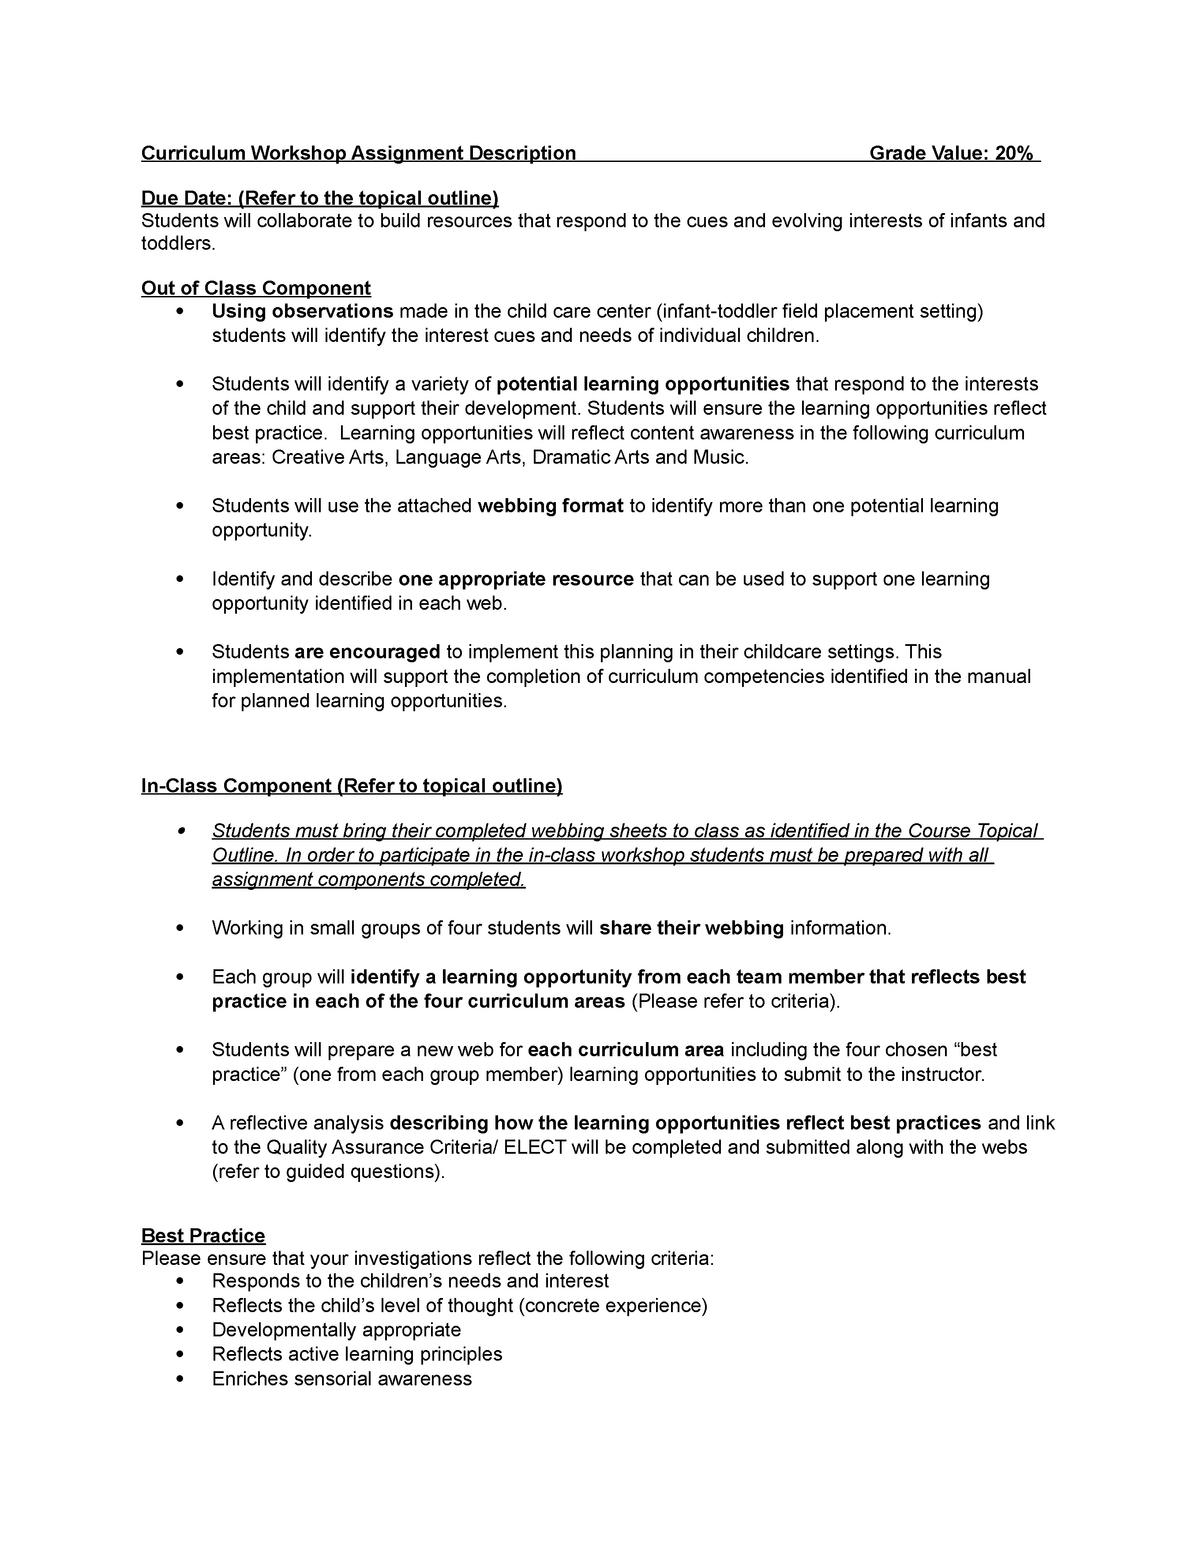 Curriculum Workshop Assignment Description Grade Value - StuDocu